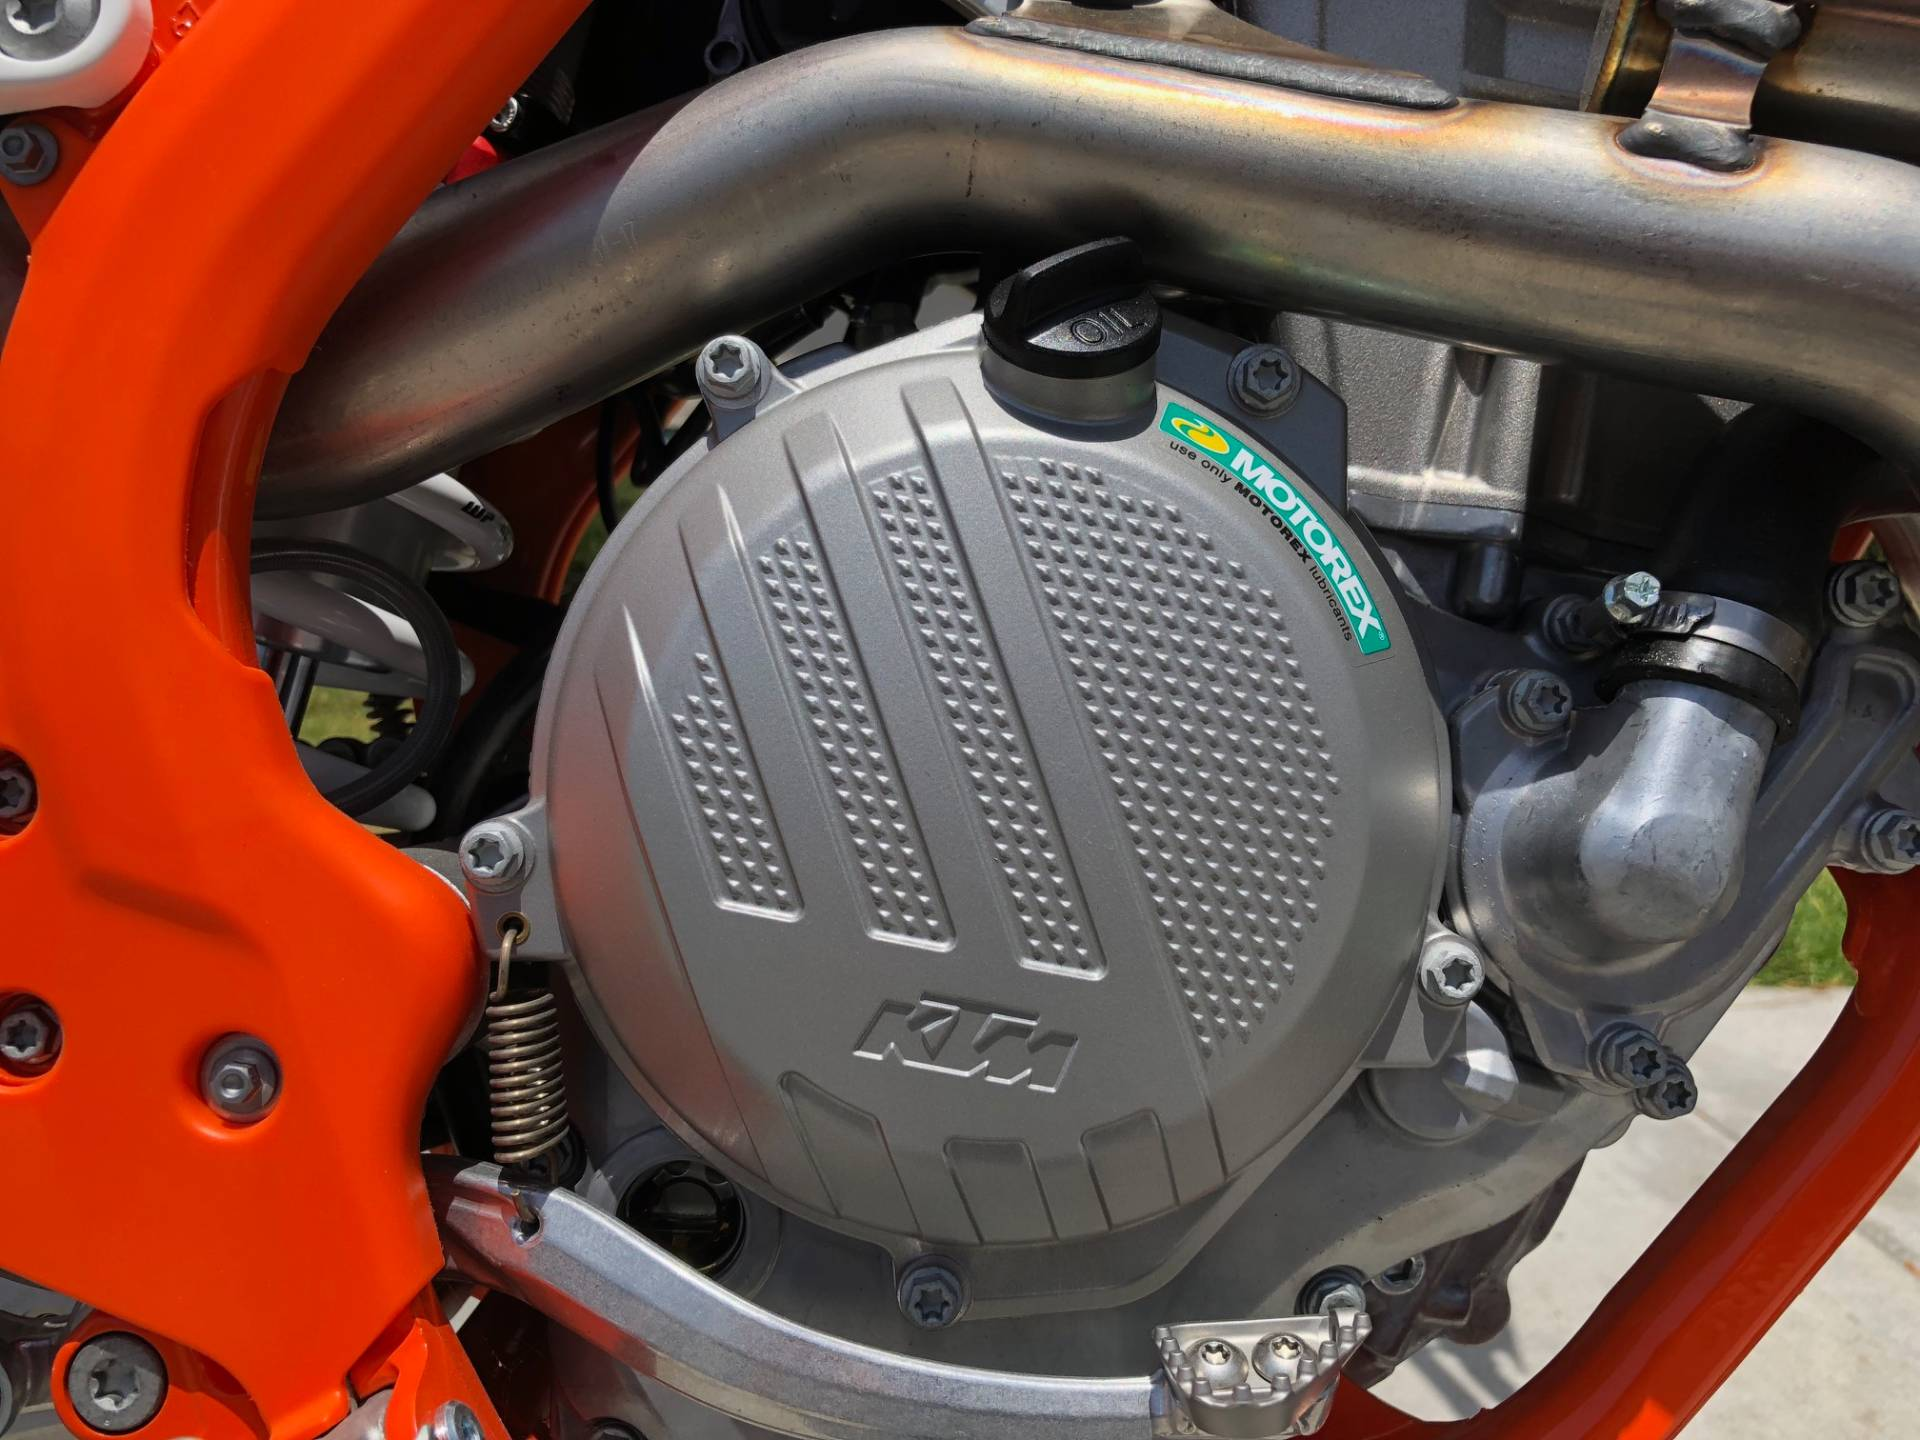 2018 KTM 350 XC-F 12